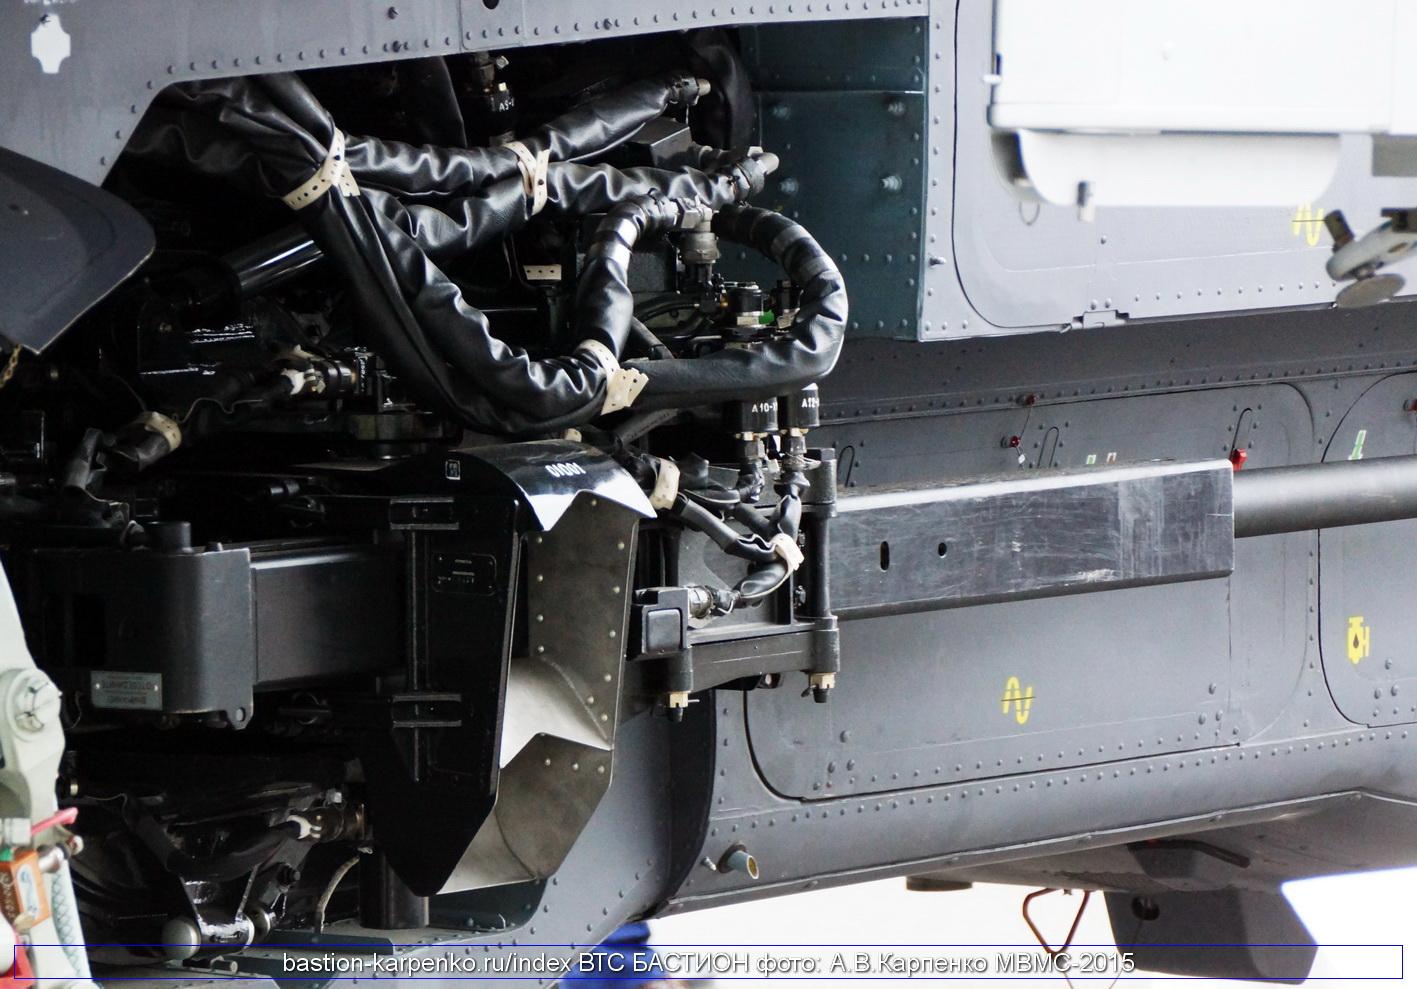 Ka-52K for Russian Navy - Page 2 KA-52K_MVMS-2015_39